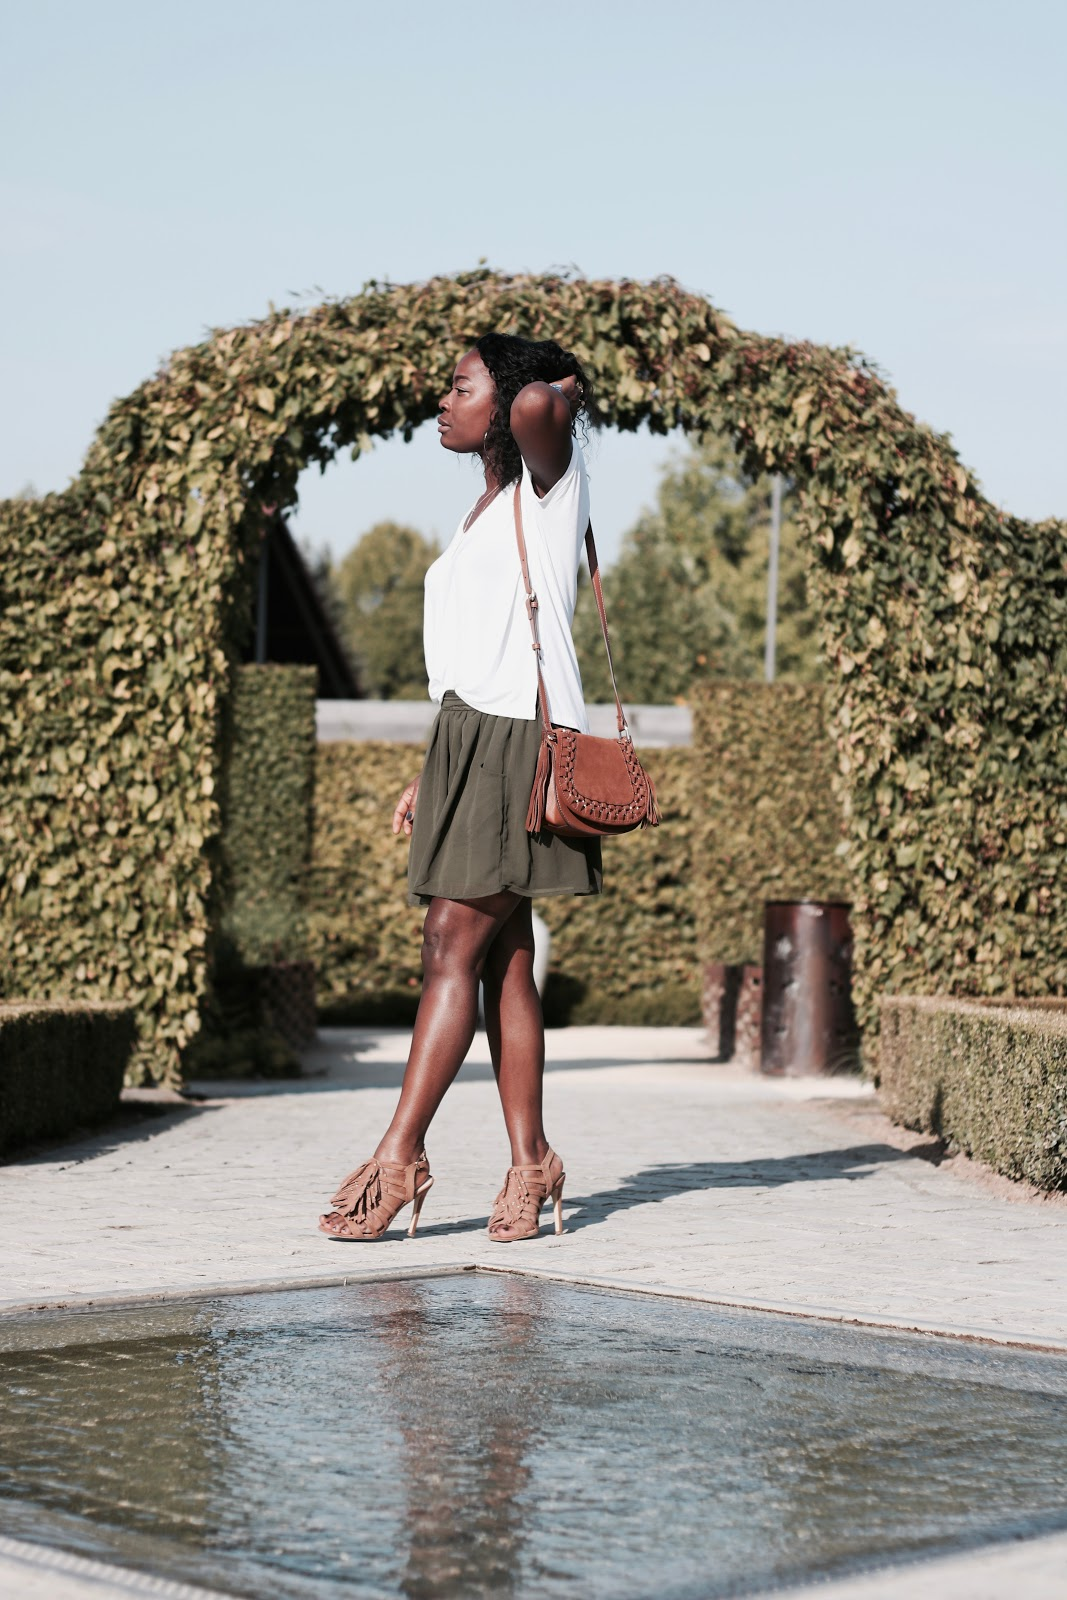 sac-mango-jupe-kaki-blog-mode-tenue-chic